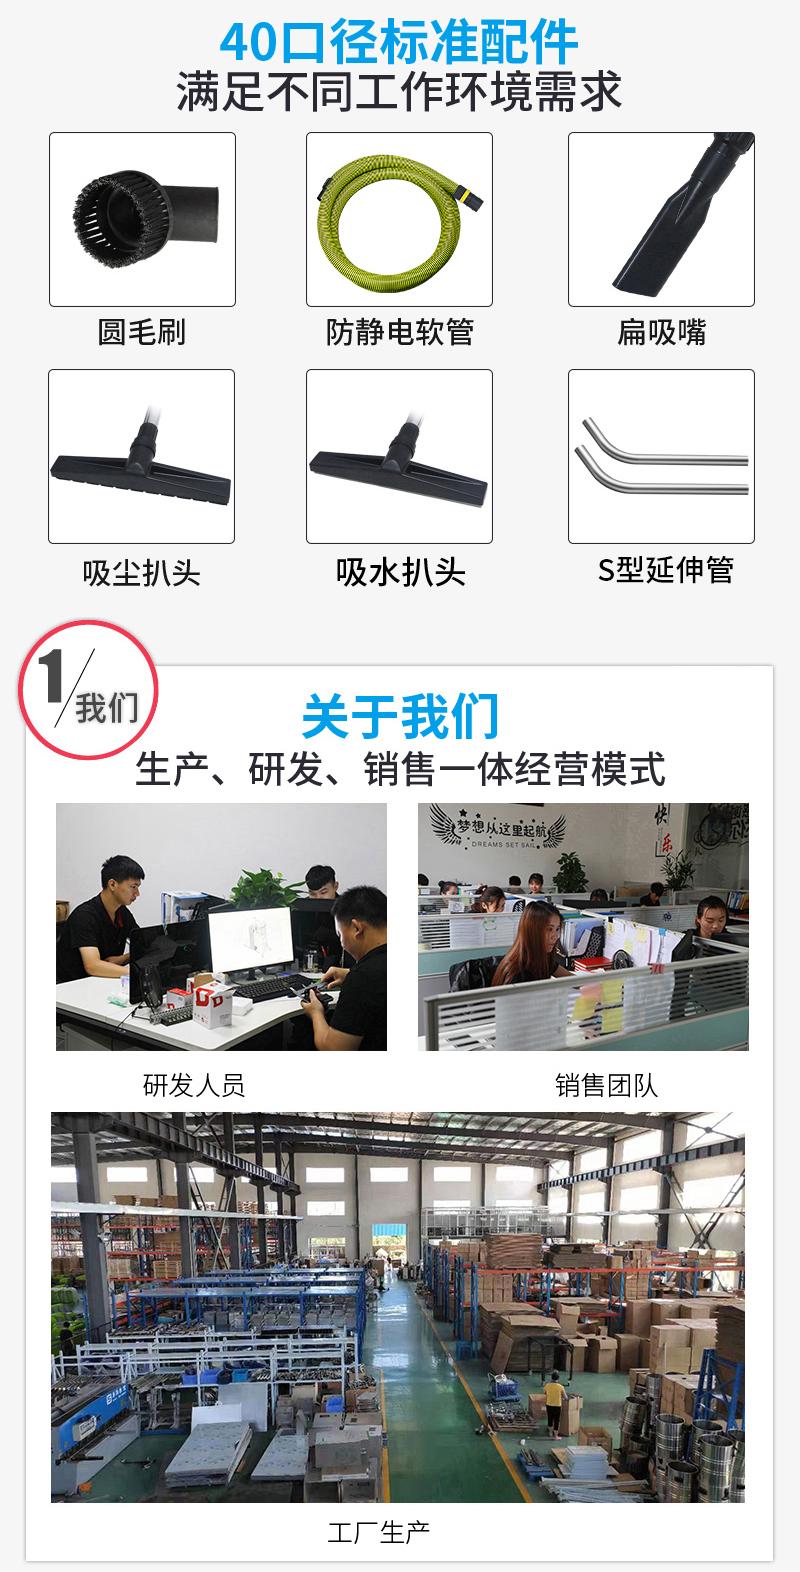 220v大功率生产厂家配件